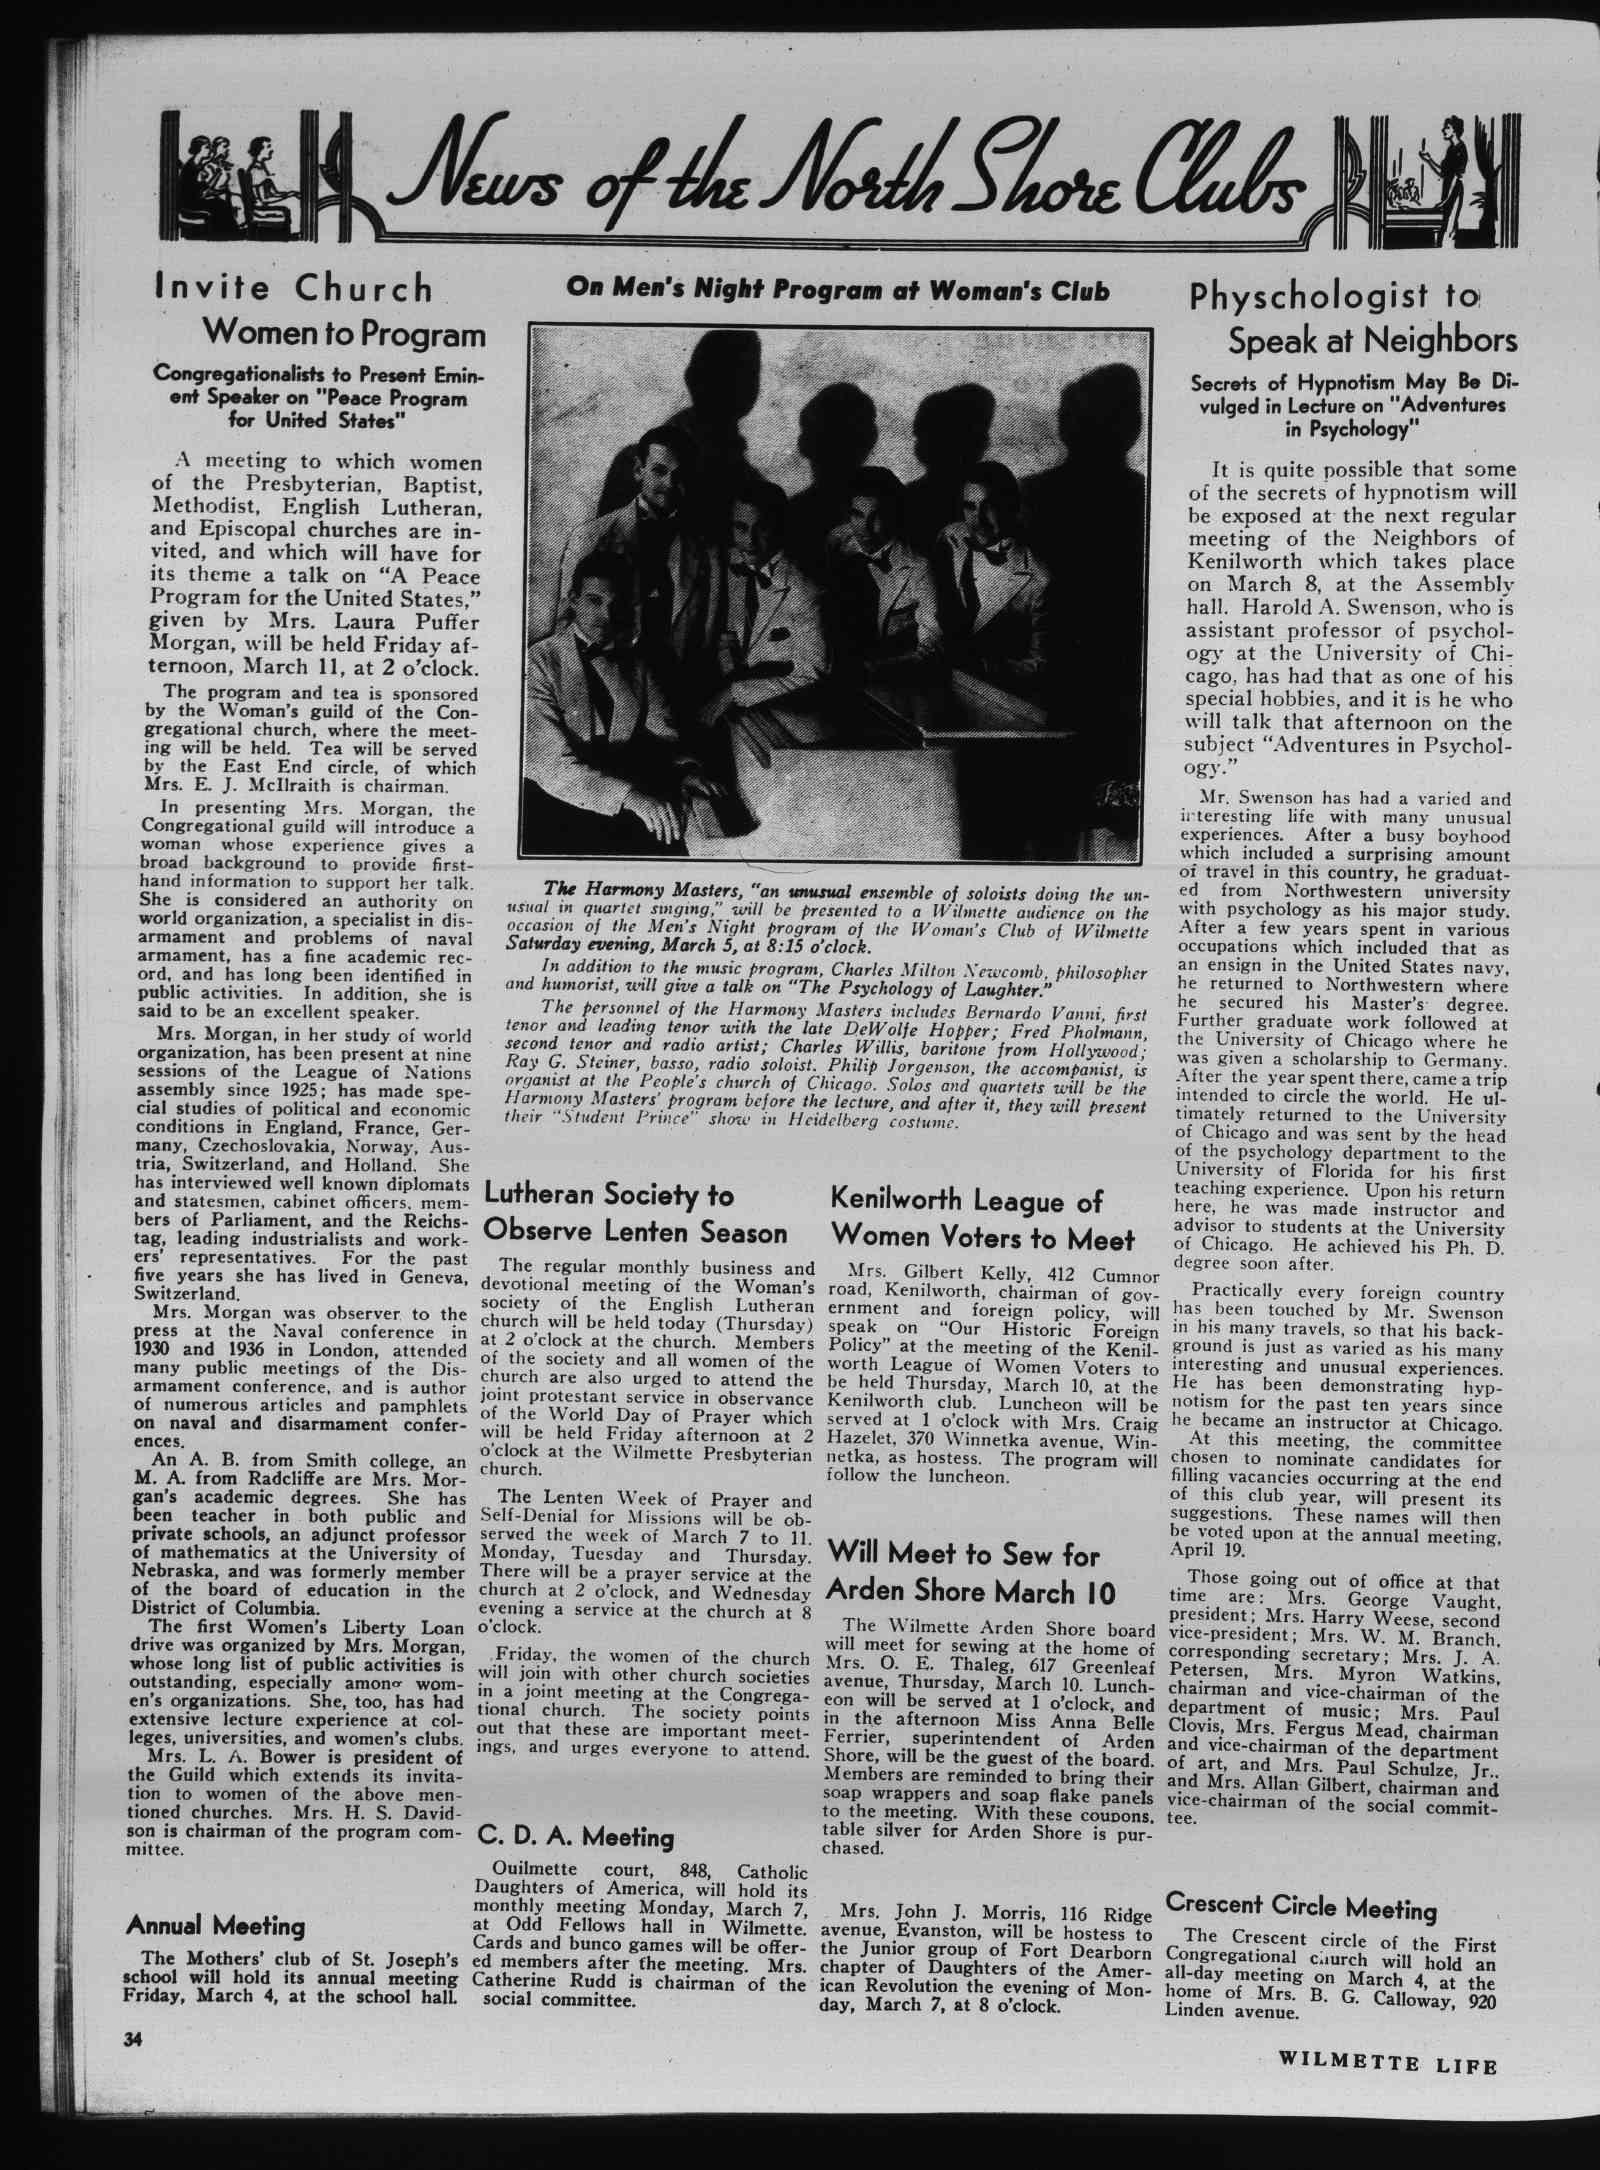 Wilmette Life (Wilmette, Illinois), 3 Mar 1938